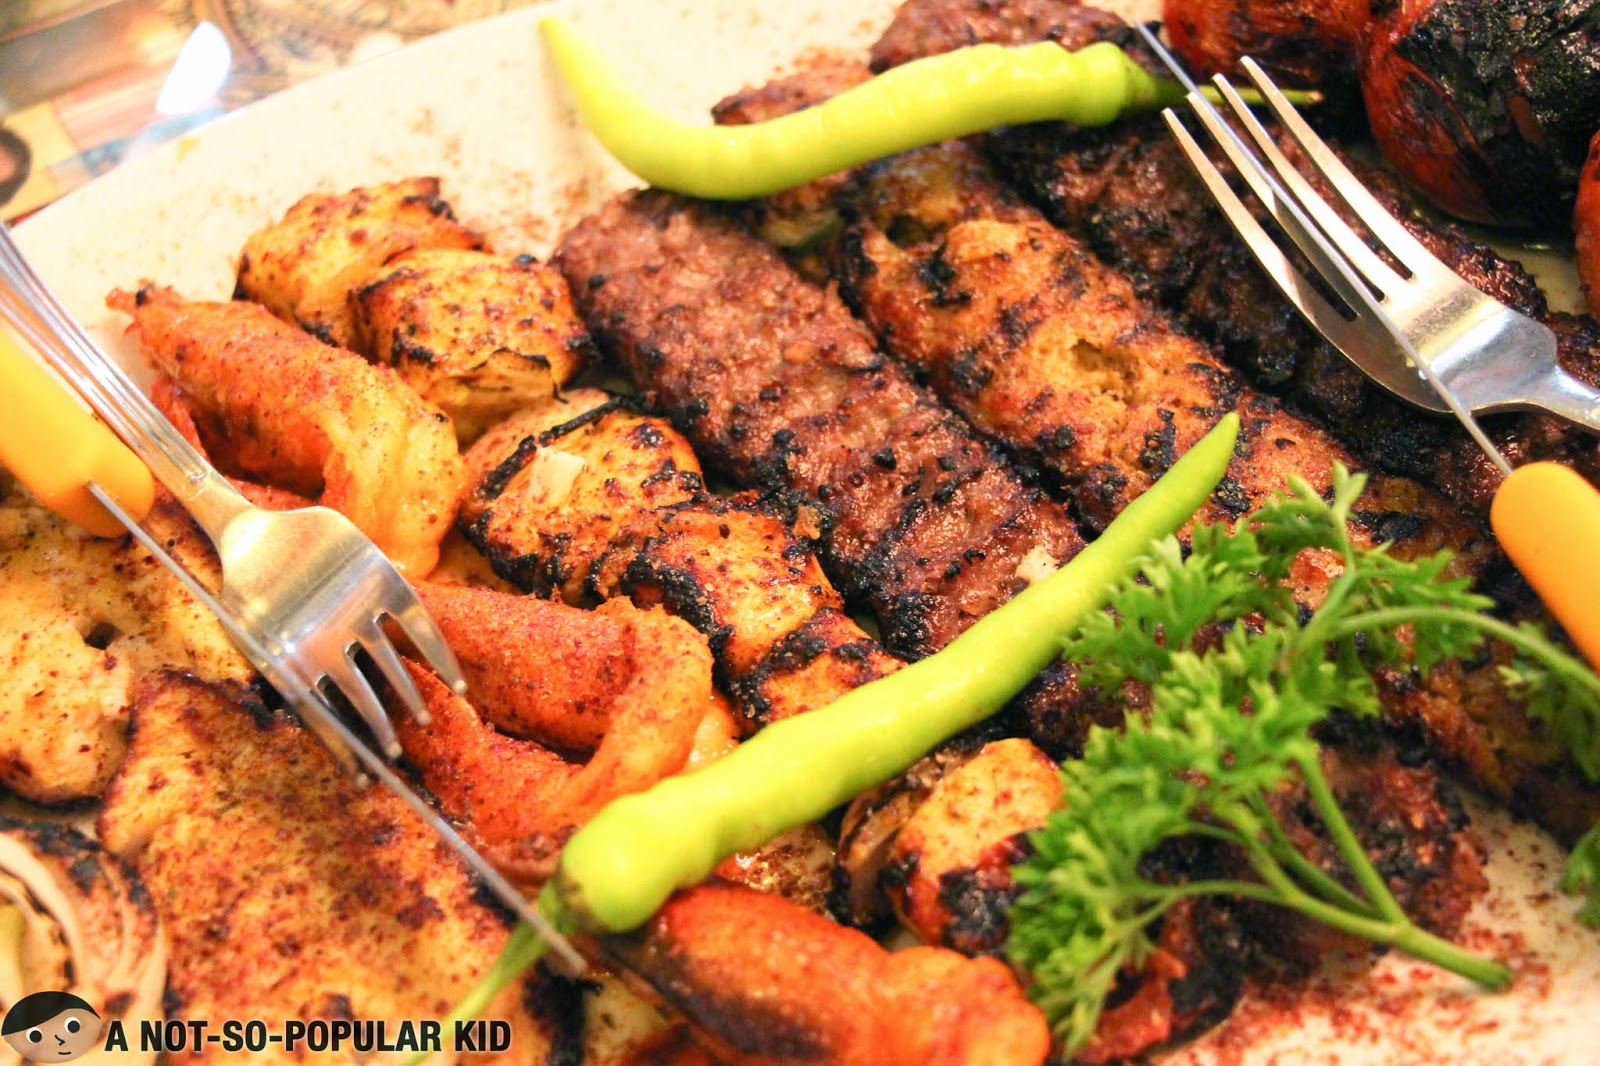 A closer look of the kebabs of the Arya Sini Kamel